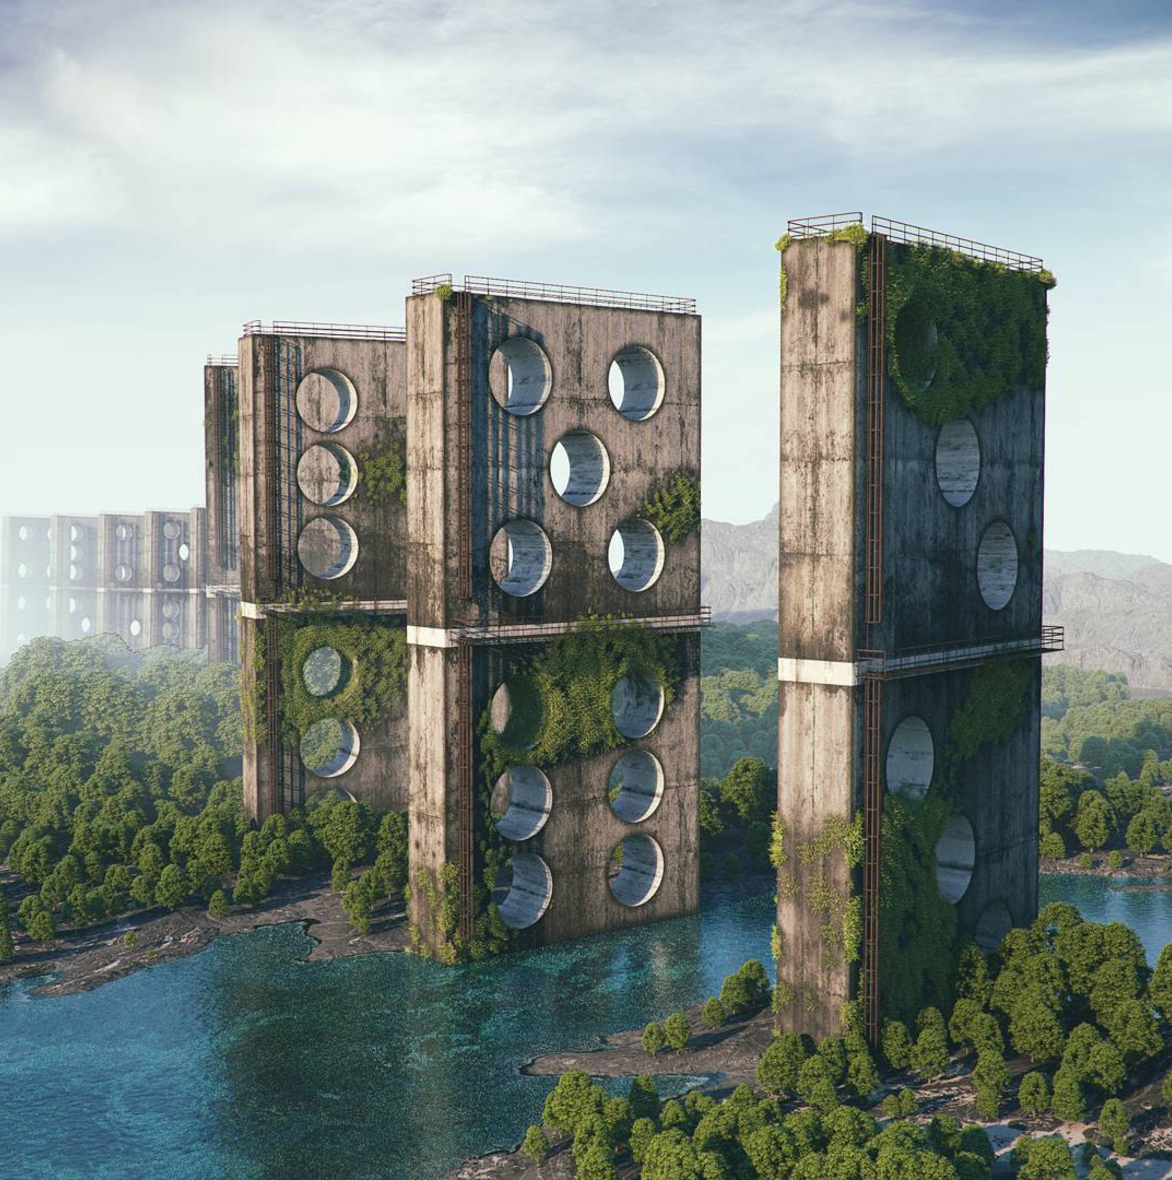 filip hodas hoodass art science fiction urbex 3D virtuel pop culture11 - Filip Hodas brouille les frontières entre urbex, sci-fi et pop culture